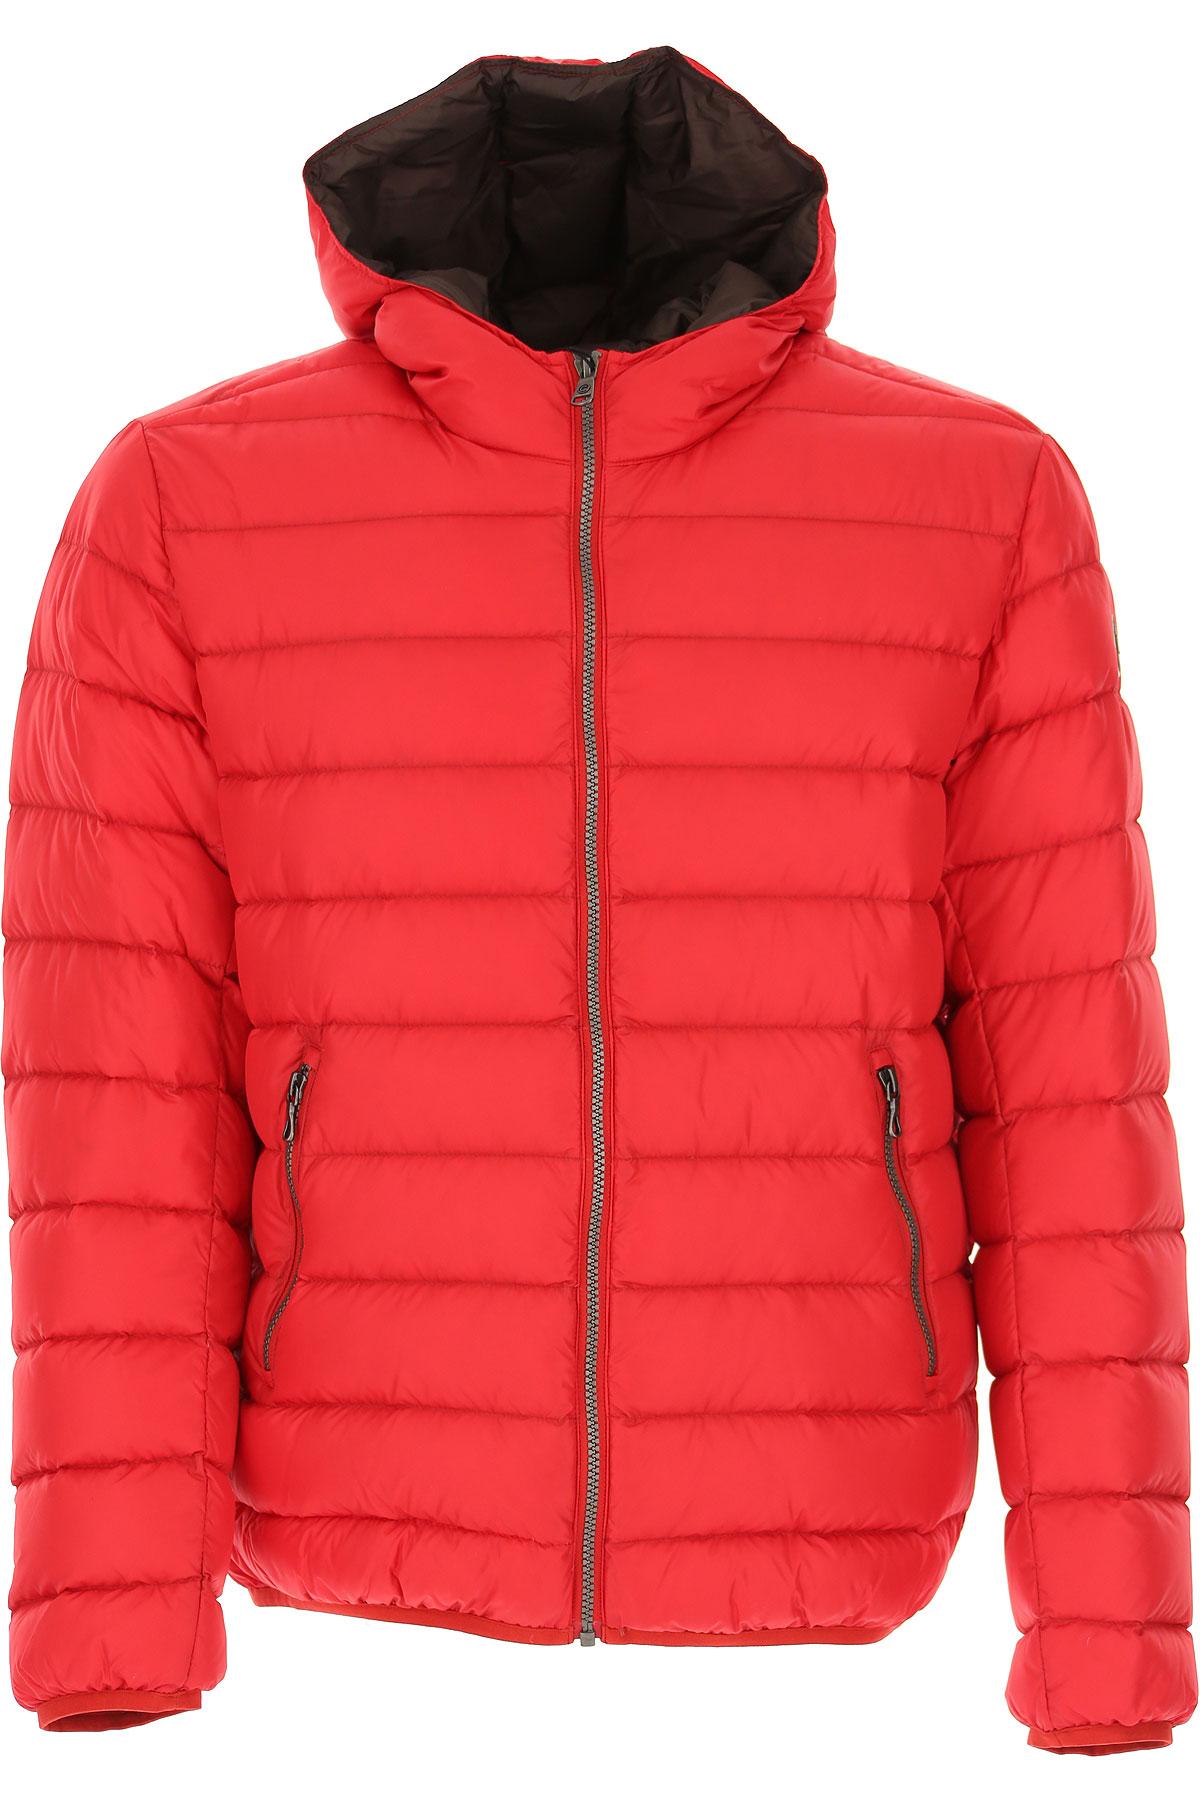 Colmar Down Jacket for Men, Puffer Ski Jacket On Sale, Red, polyamide, 2019, L M XL